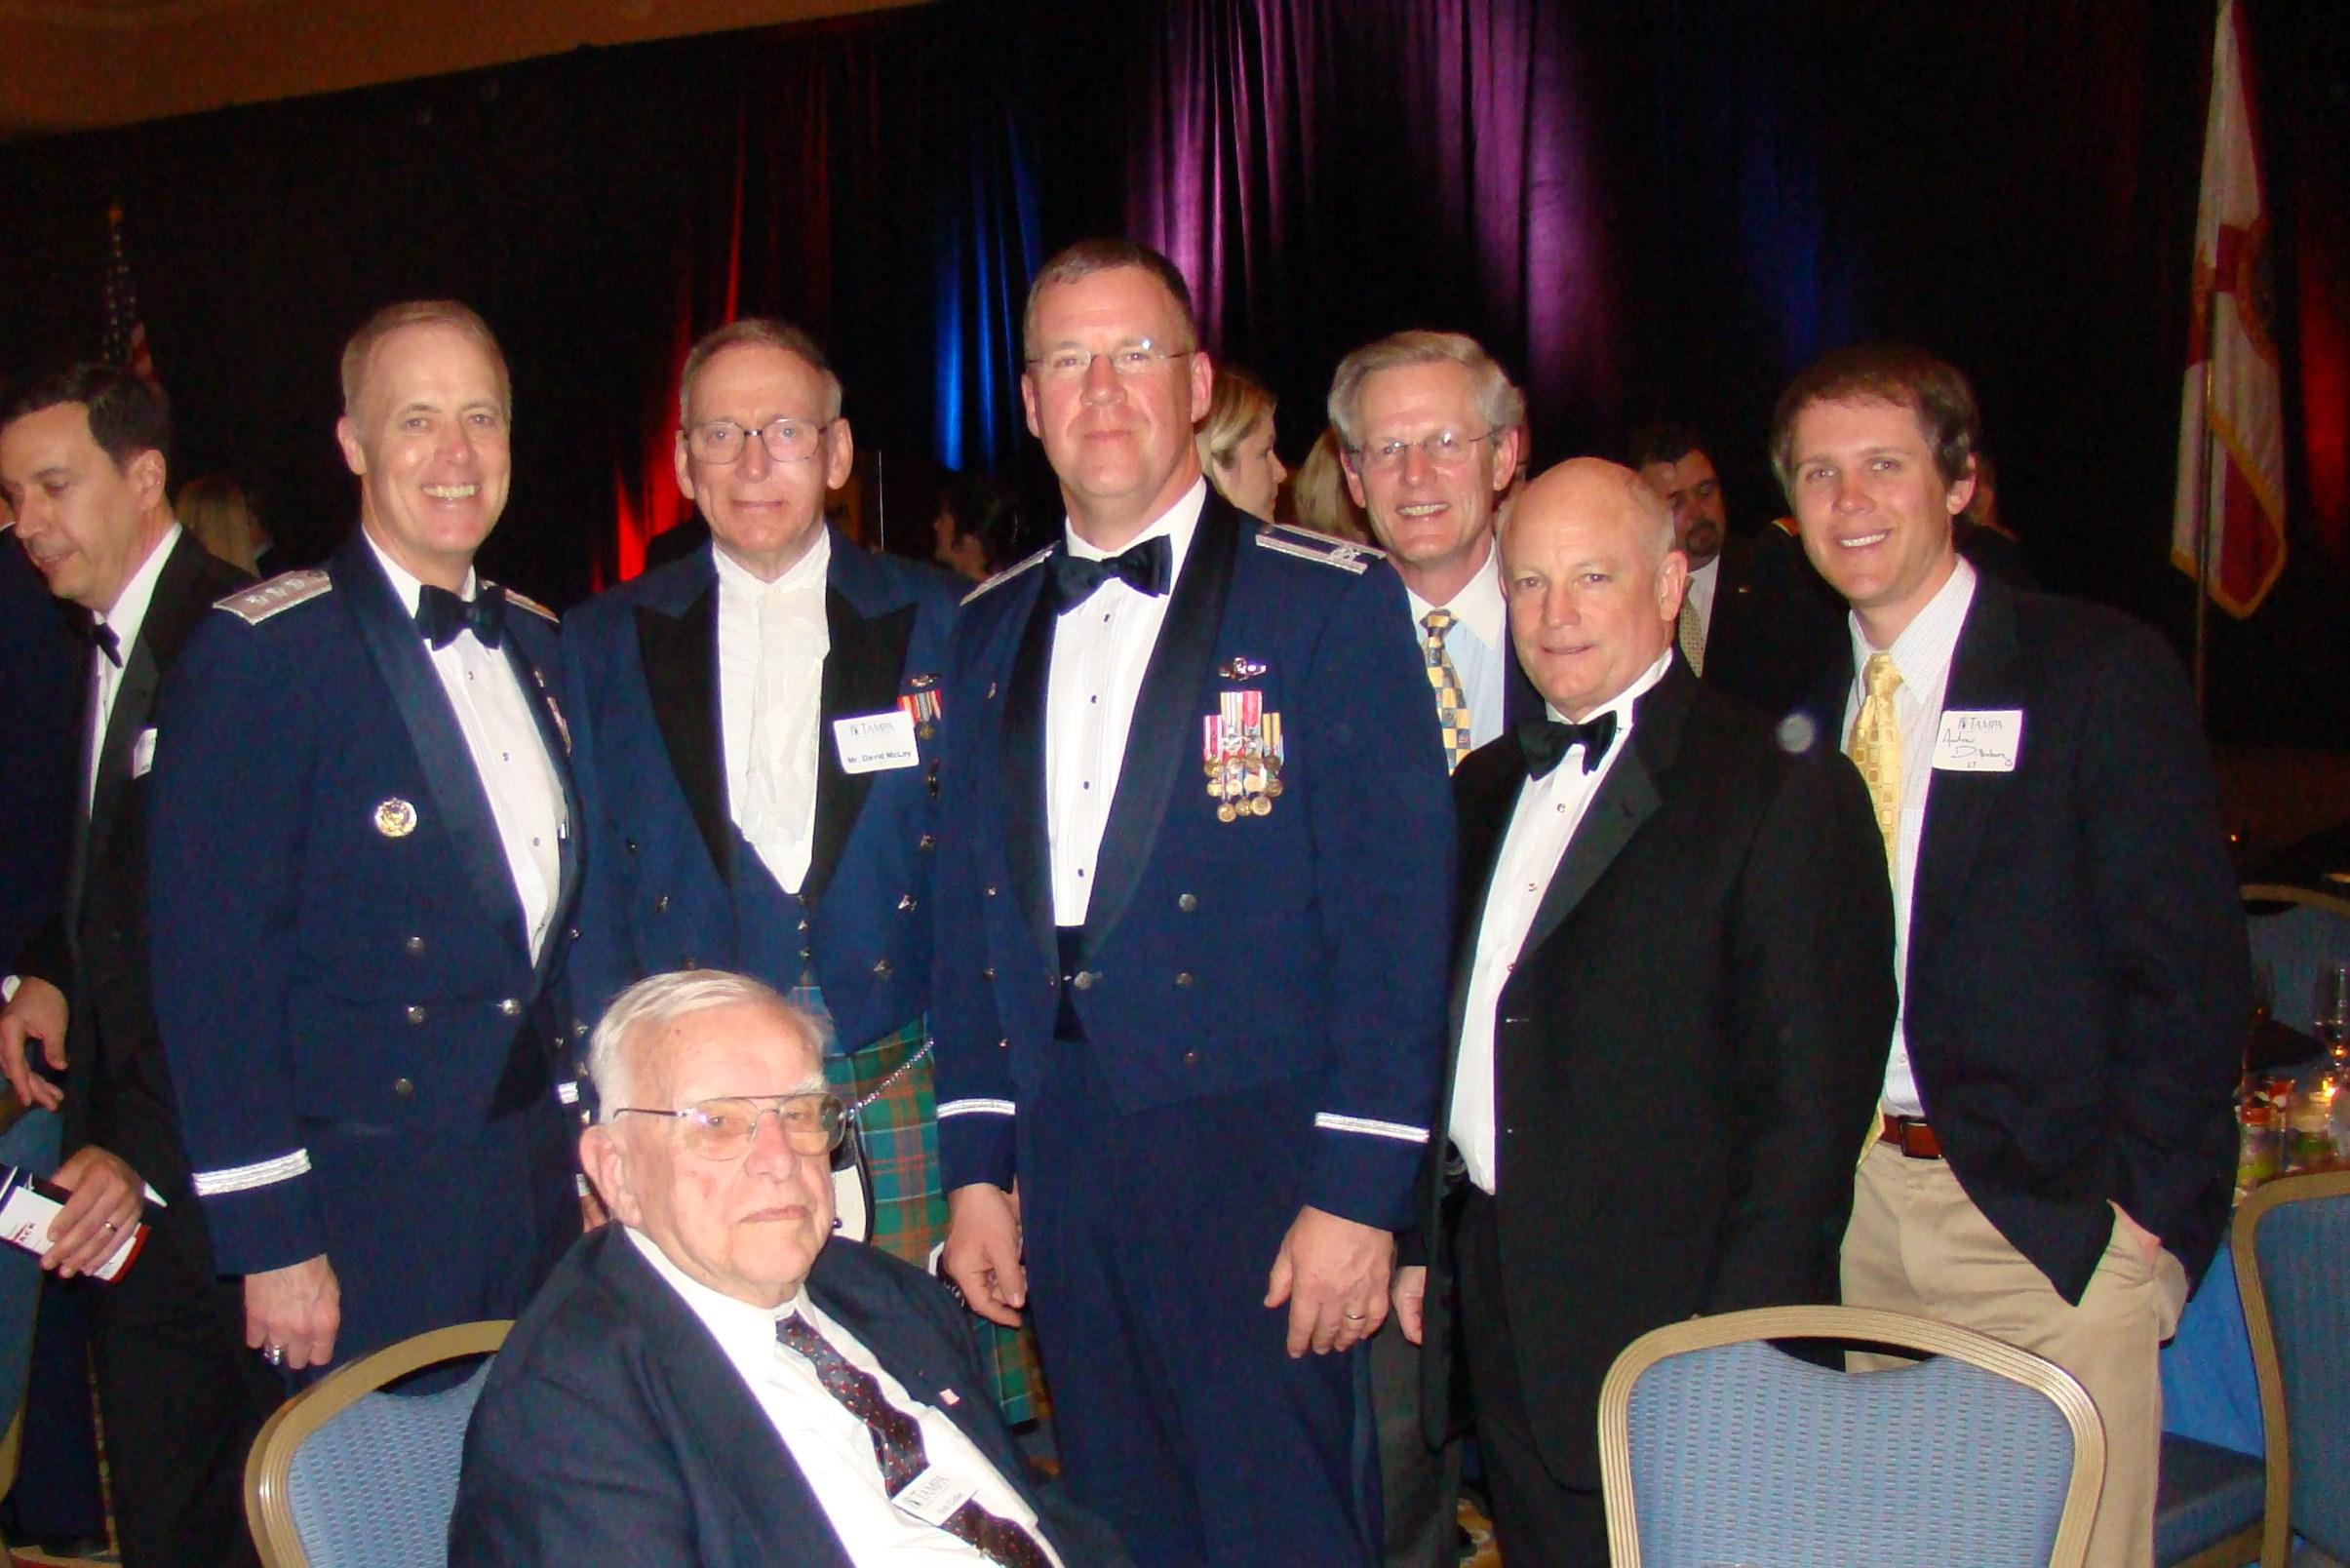 Dick, David McLay, Larry Martin, Steve Dillenburg, Ned Hance, & Andrew D. with Bob Cutler, 16 Feb '10.JPG